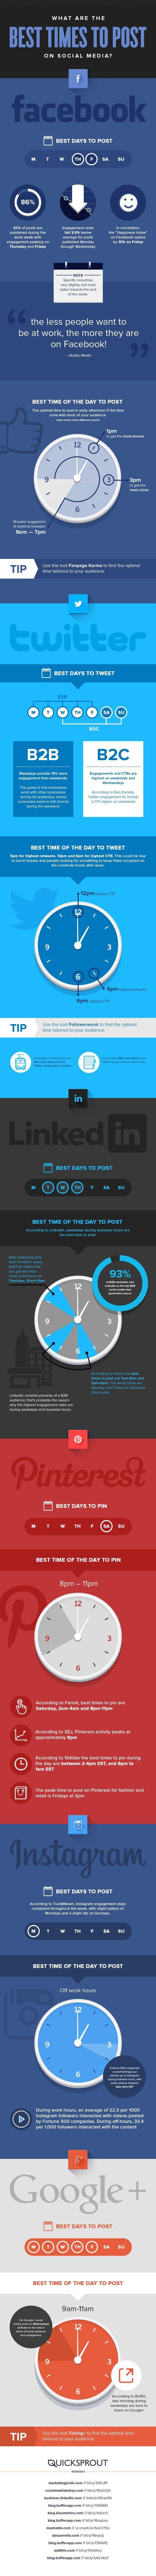 20 best Design ideas images on Pinterest | Social media, Business ...